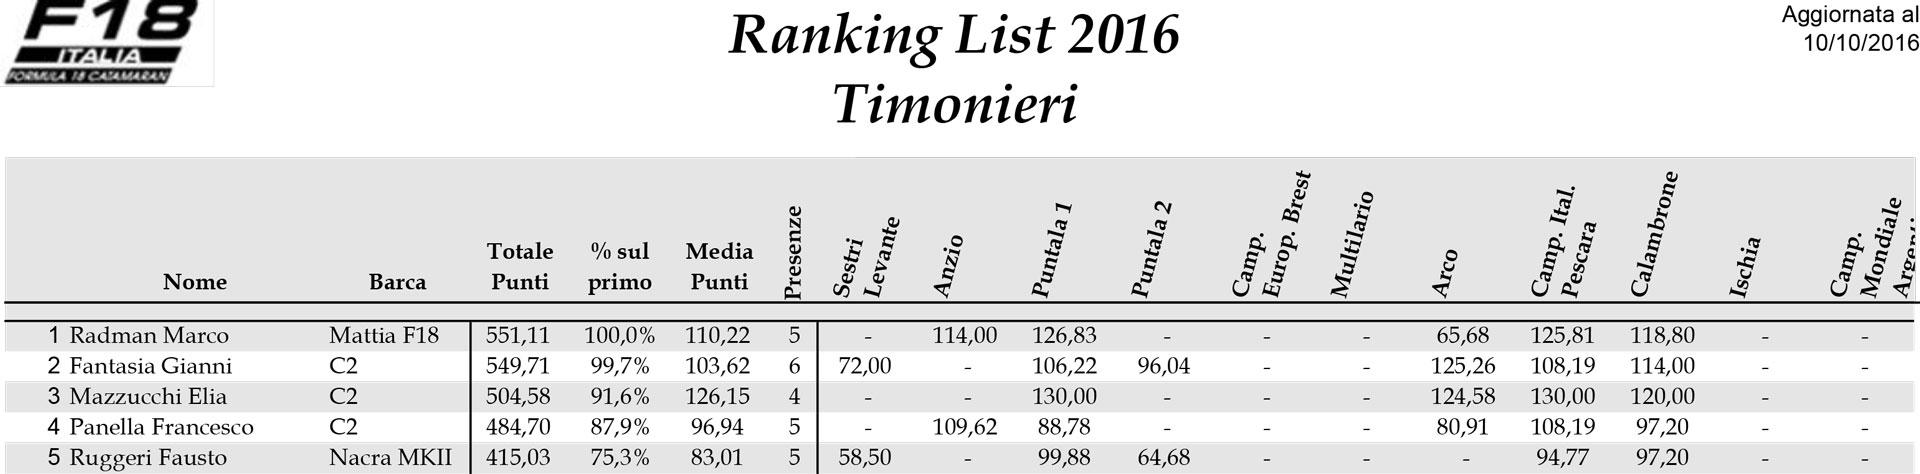 ranking-list-f18-2016-timonieri